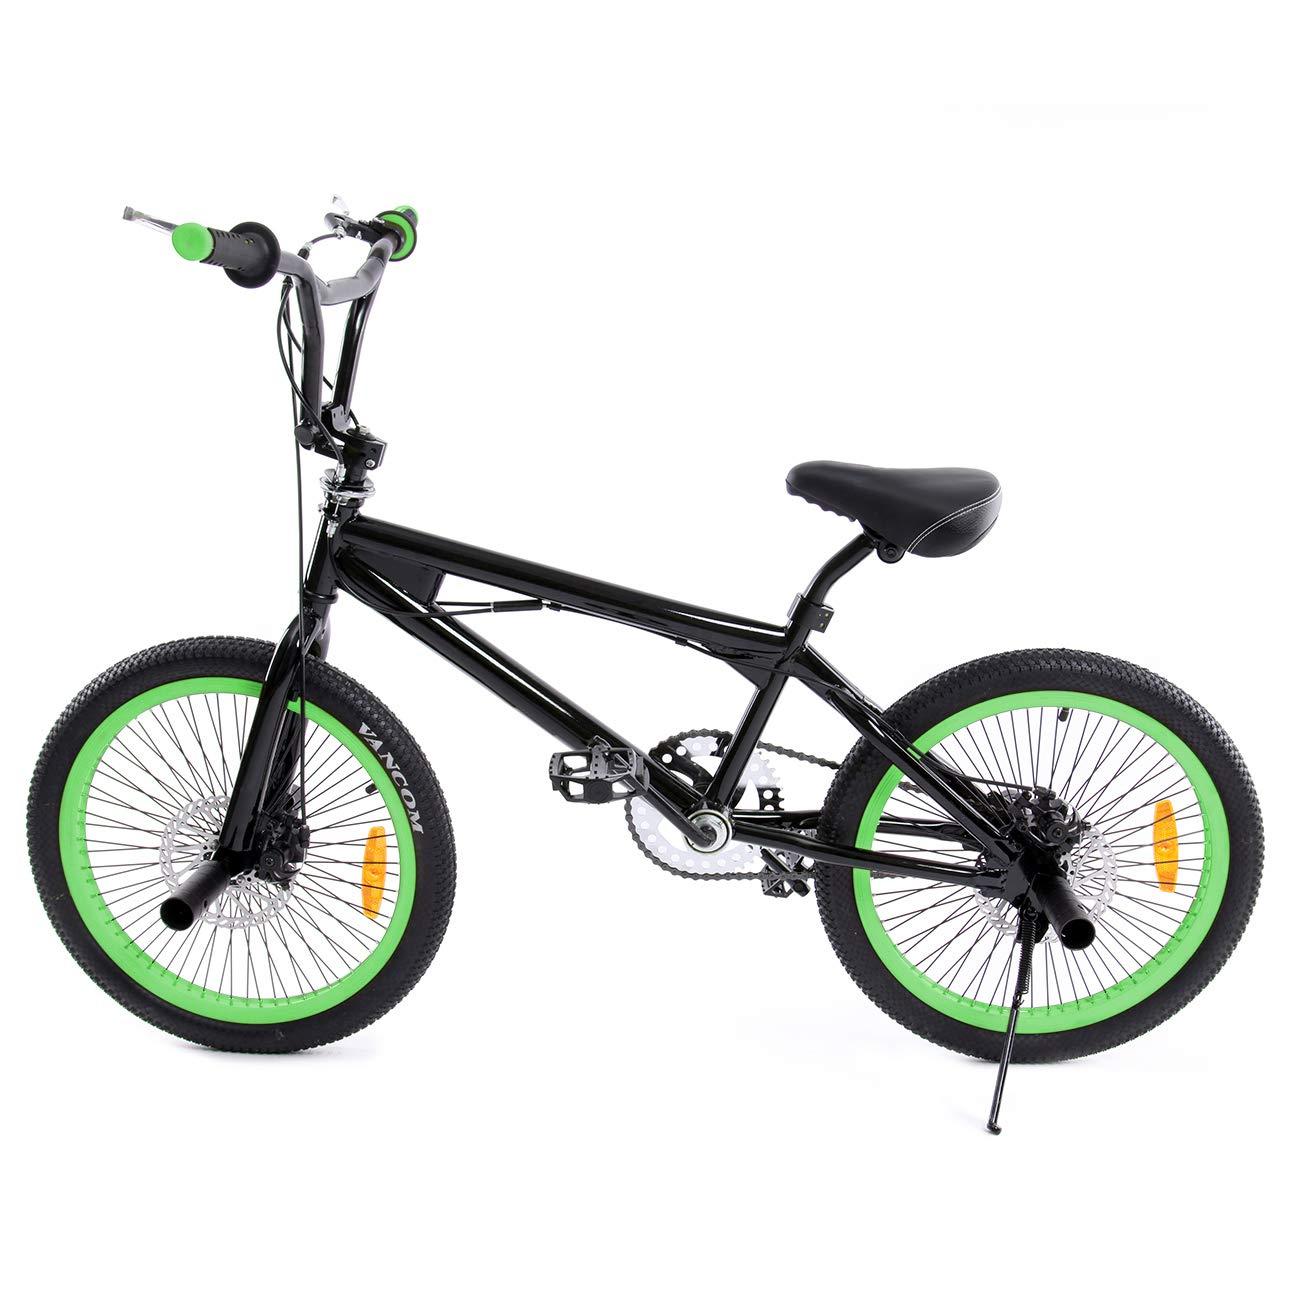 Ridgeyard Bicicleta BMX Free-style 20 pulgadas Rotor 360 °4 clavijas bmx bikes (Negro + Rojo) Ridgeyard Co .ltd